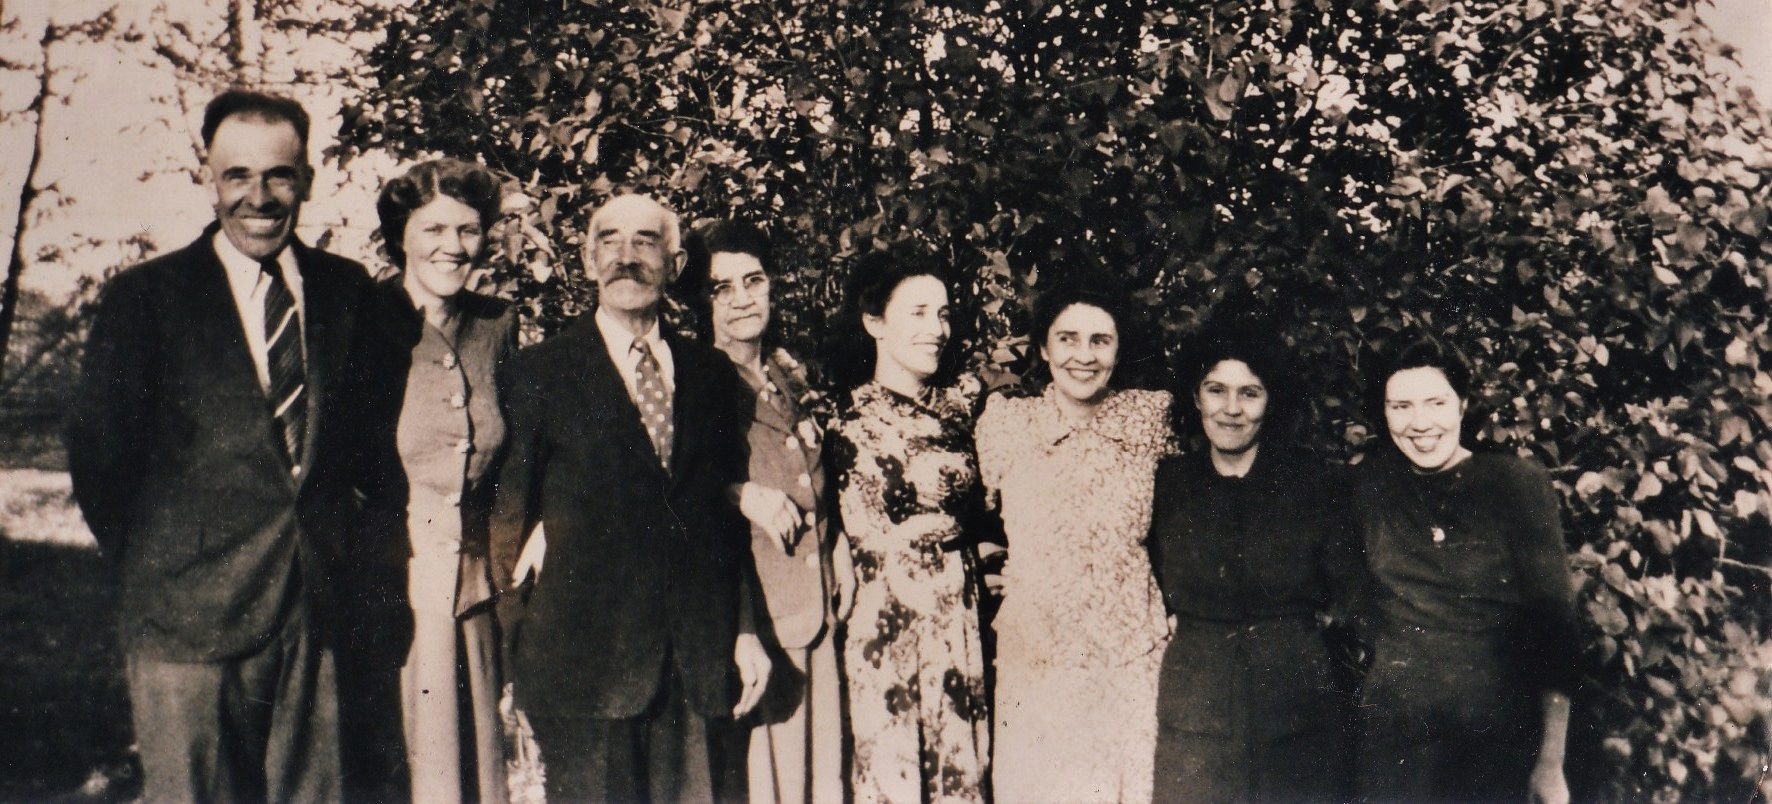 Milo VanVolkenurg, Mary Flintoff, Simona dn Matilda VanVolkenburg, Grace Reid, Reta Moore, Robena Ellis and Beatrice Wilson